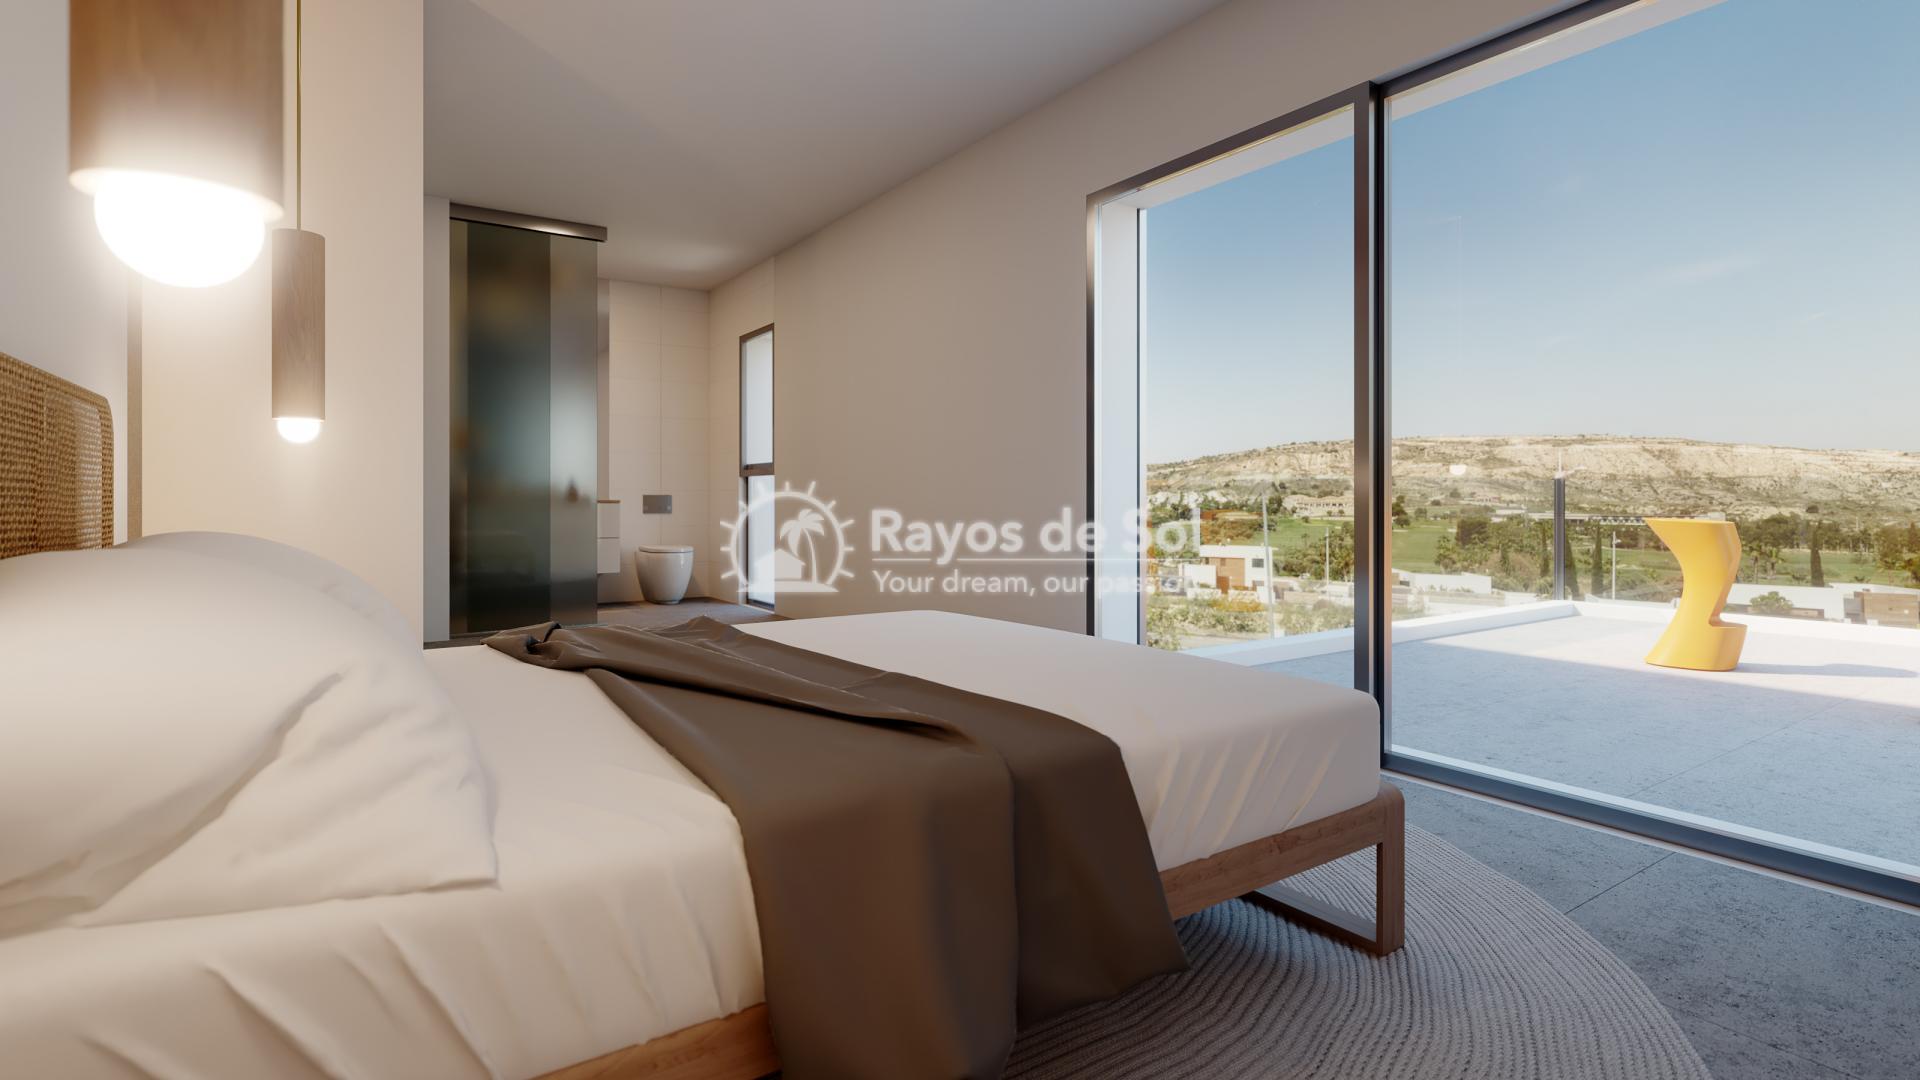 Luxury newbuild villa in La Finca Golf, Algorfa, Costa Blanca (LFPADI) - 13